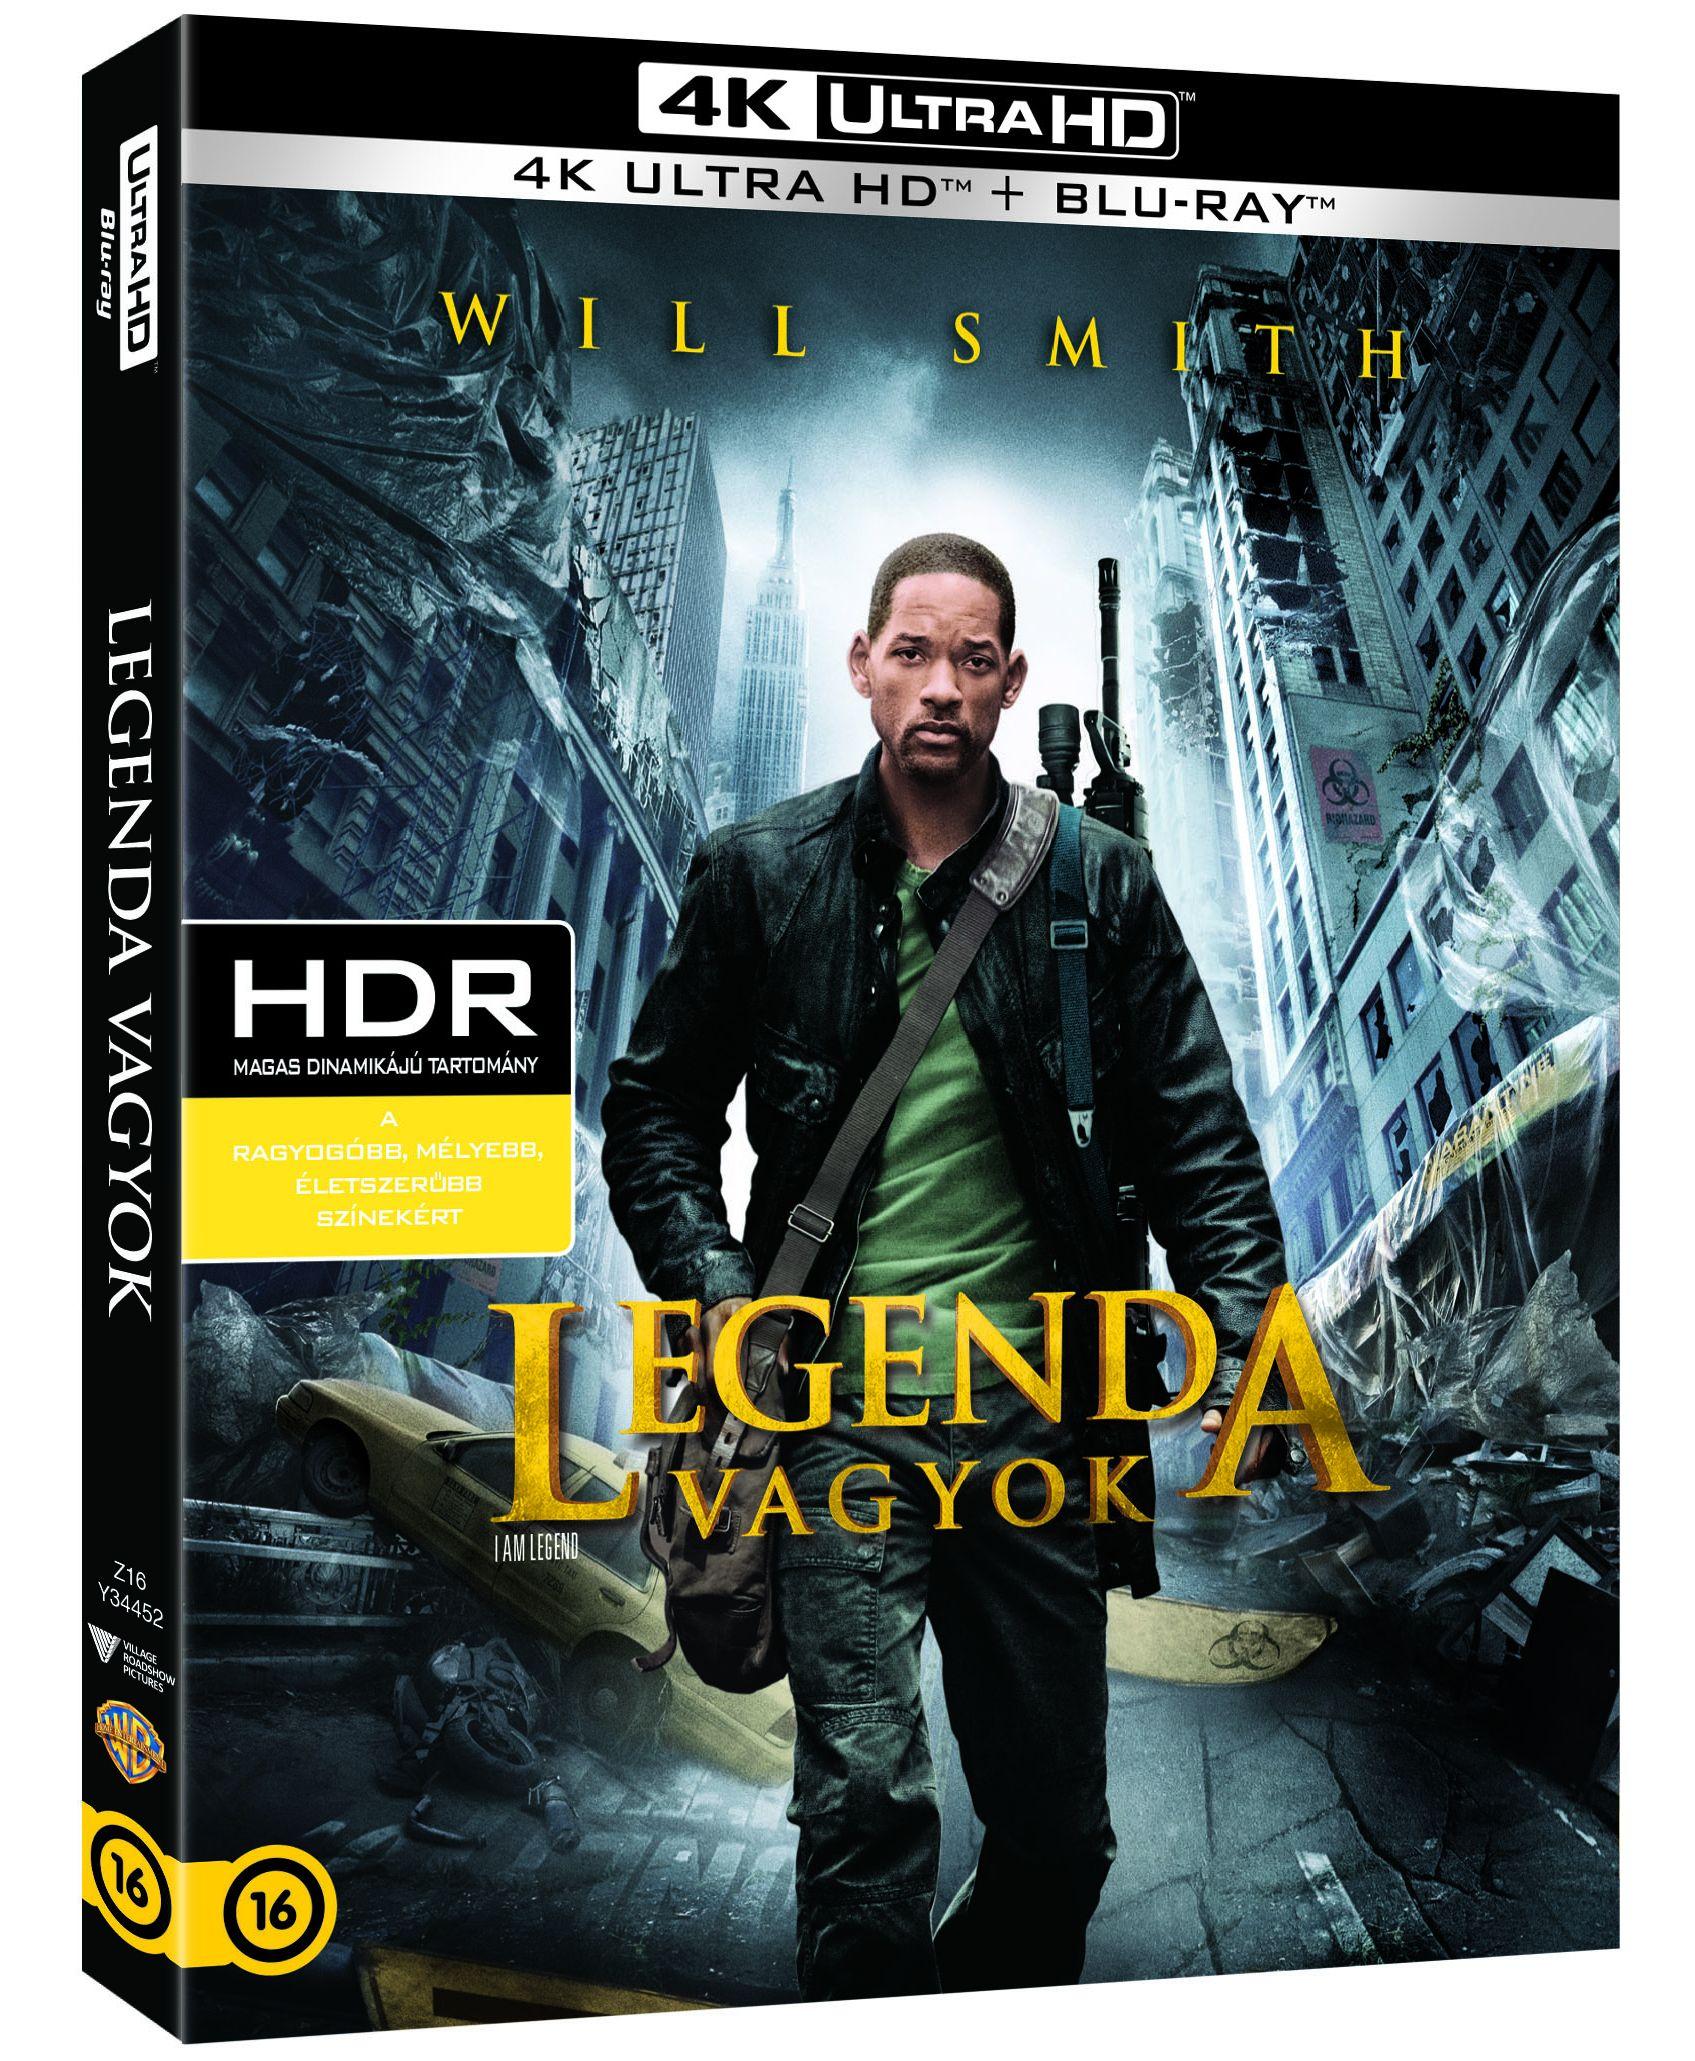 Legenda vagyok (4K Blu-ray + Blu-ray) Blu-ray